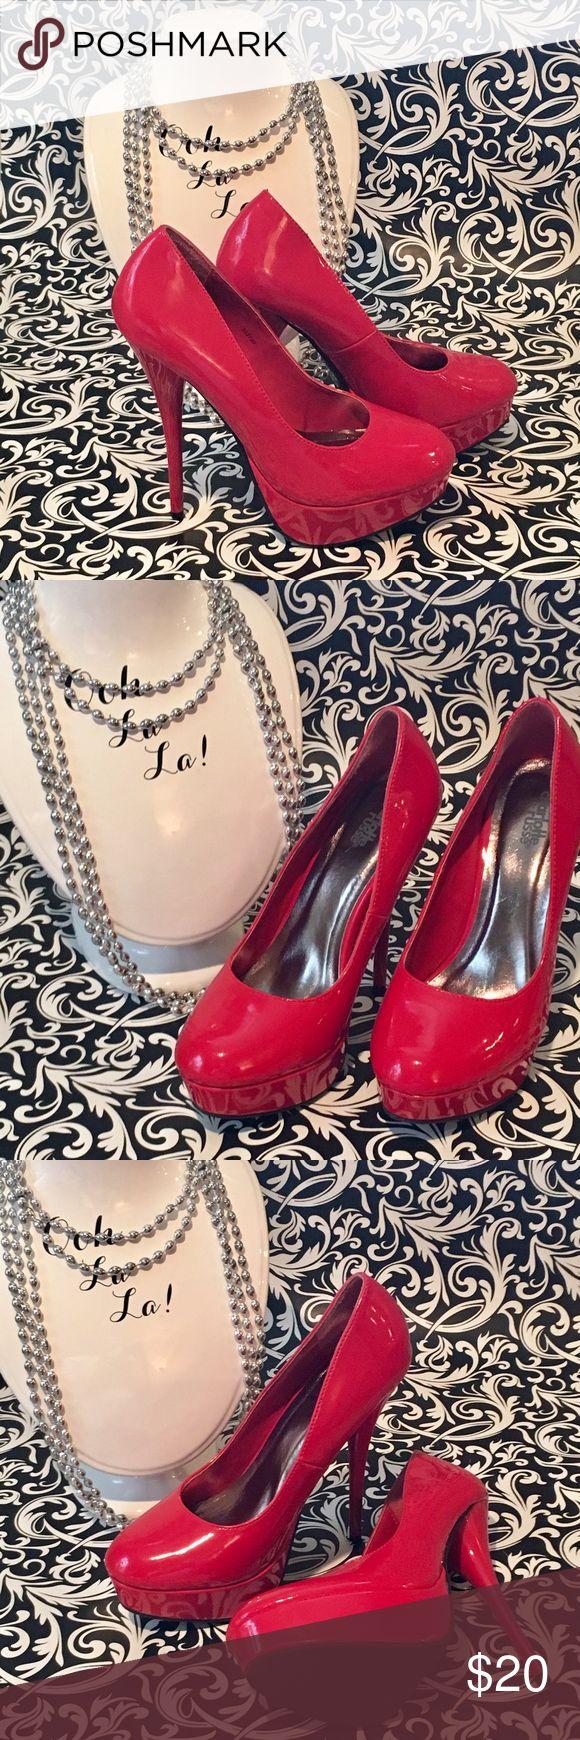 "Charlotte Russe Red Platform heels Charlotte Russe Red Platform heels, size 7. 5-1/2"" heel, 1"" platform Charlotte Russe Shoes Heels"